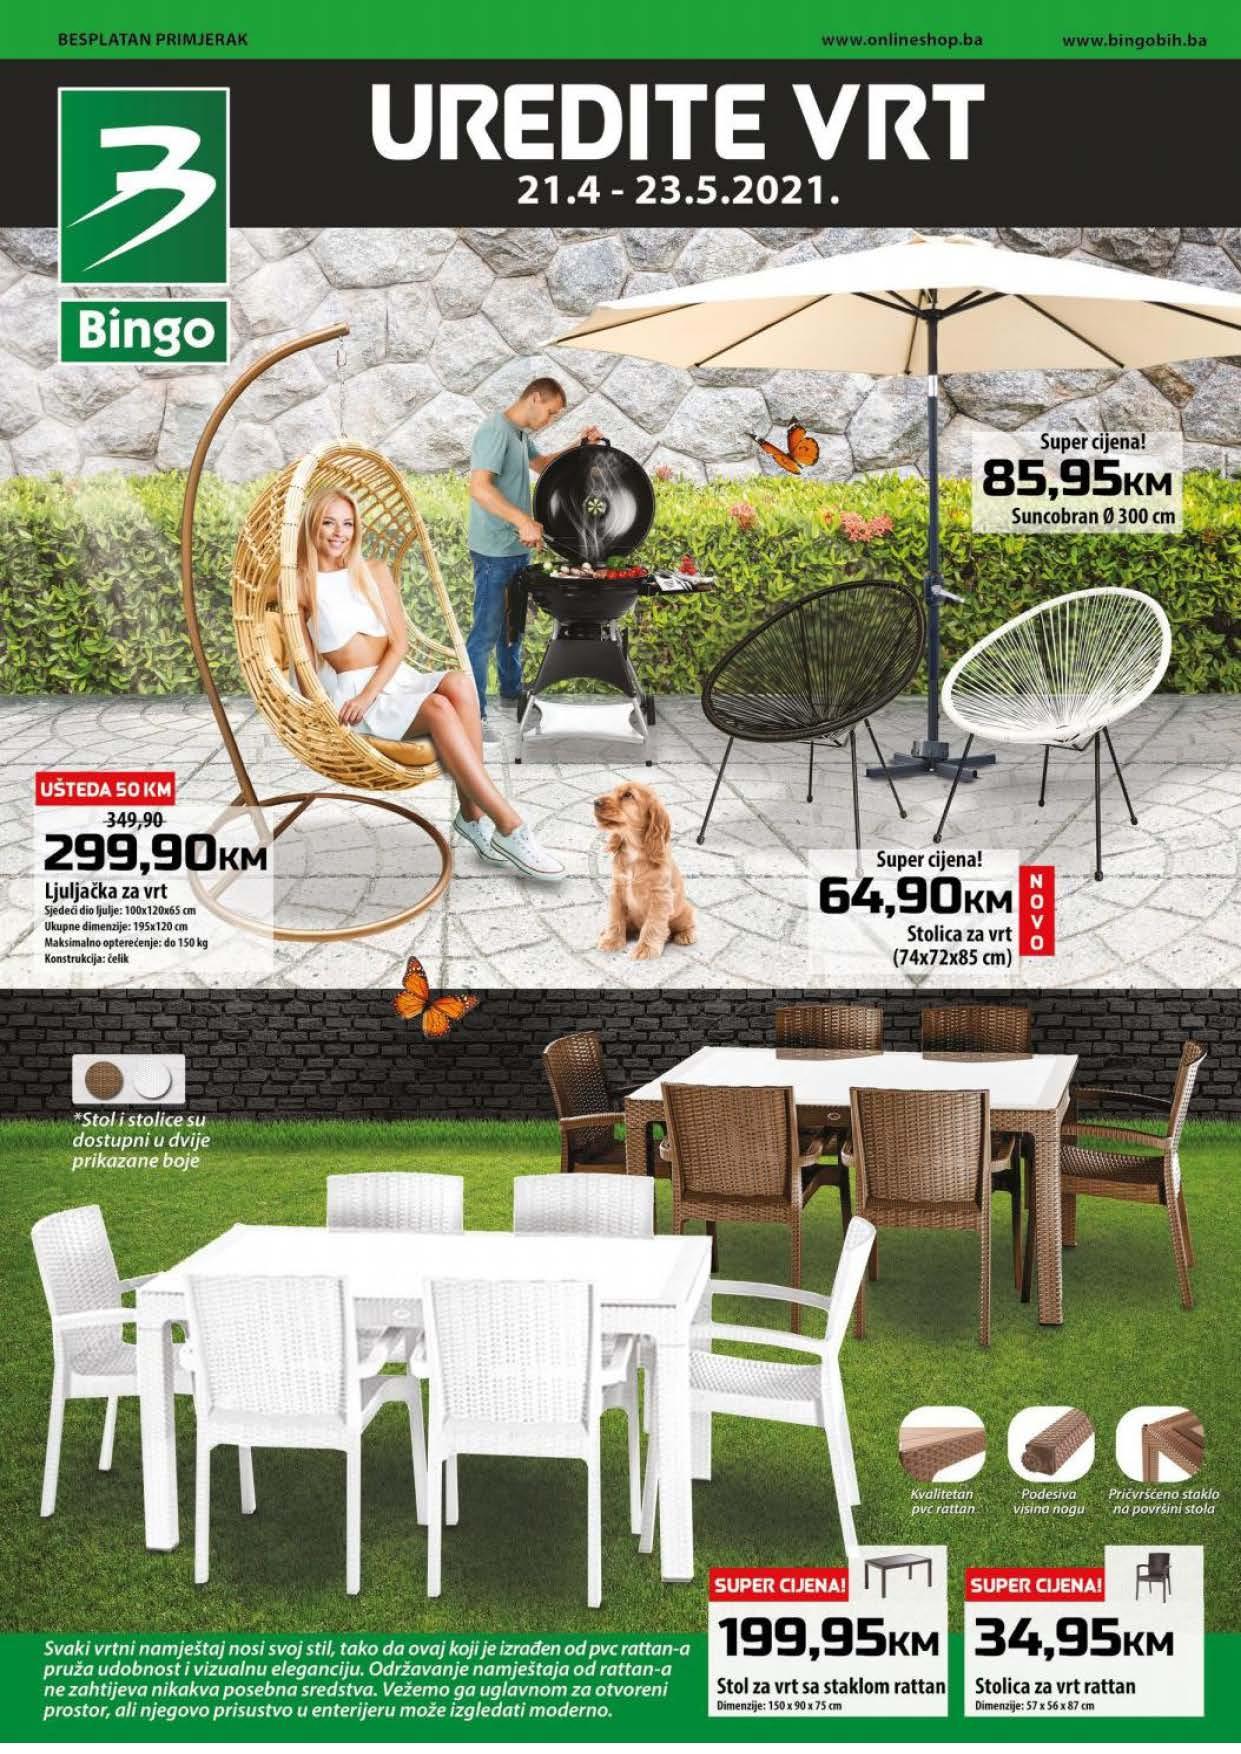 BINGO Katalog Uredite VRT APRIL I MAJ 2021 21.04.2021. 23.05.2021 Page 1 1